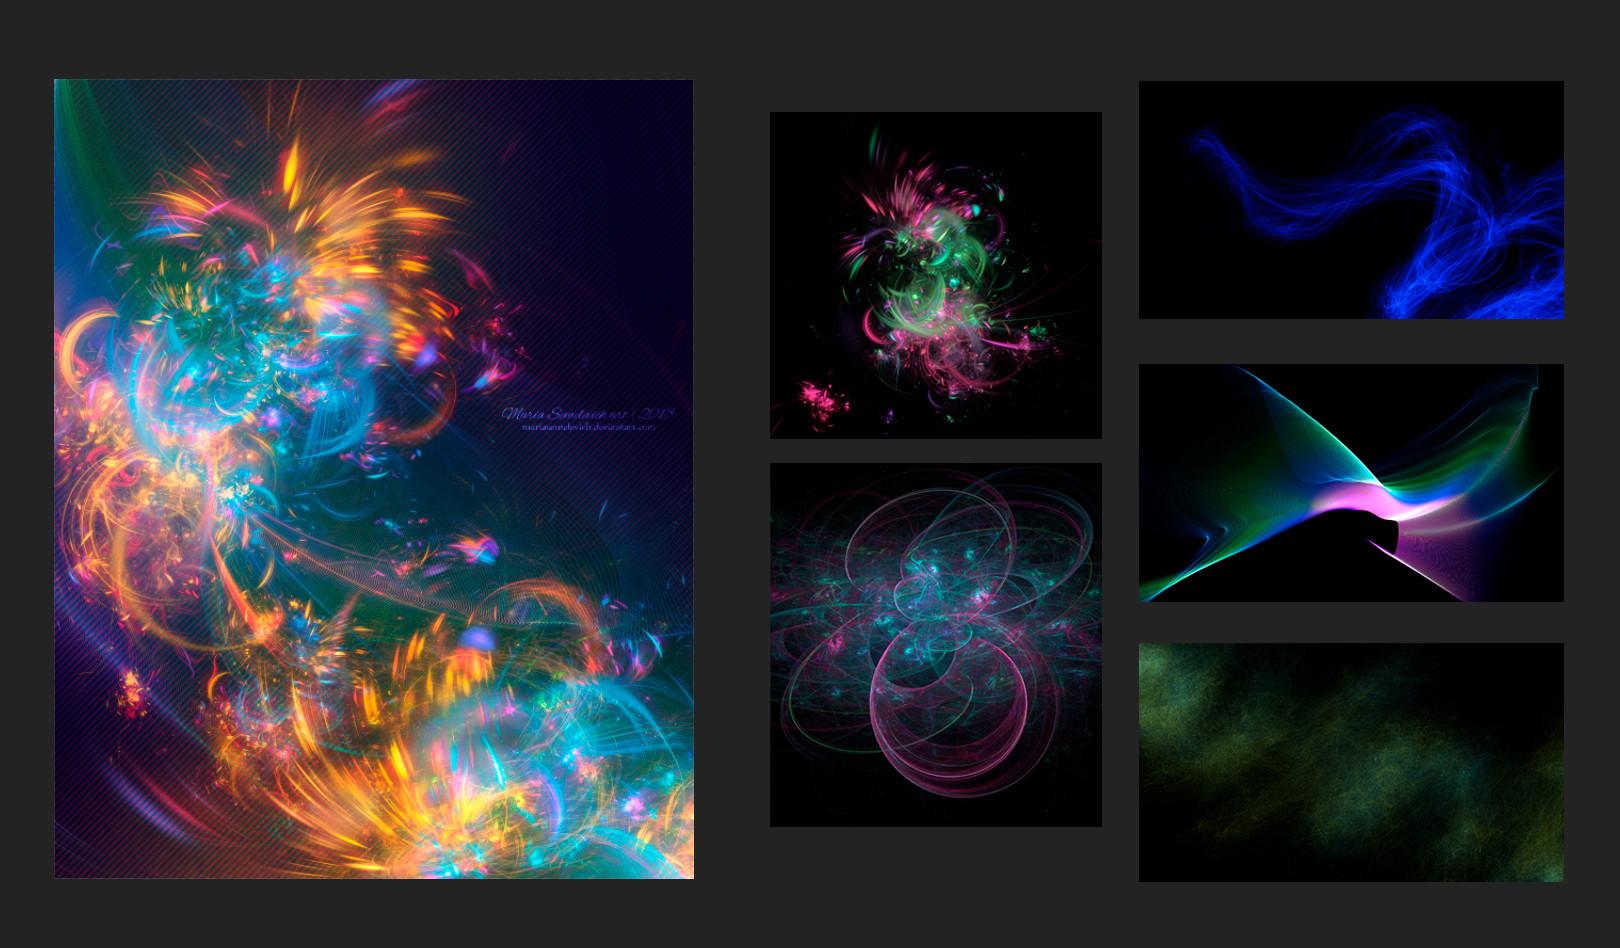 Artstation fractal design maria semelevich httpspsdvaultphoto effectvip exclusive tutorial fractals can evolve art photoshop baditri Gallery